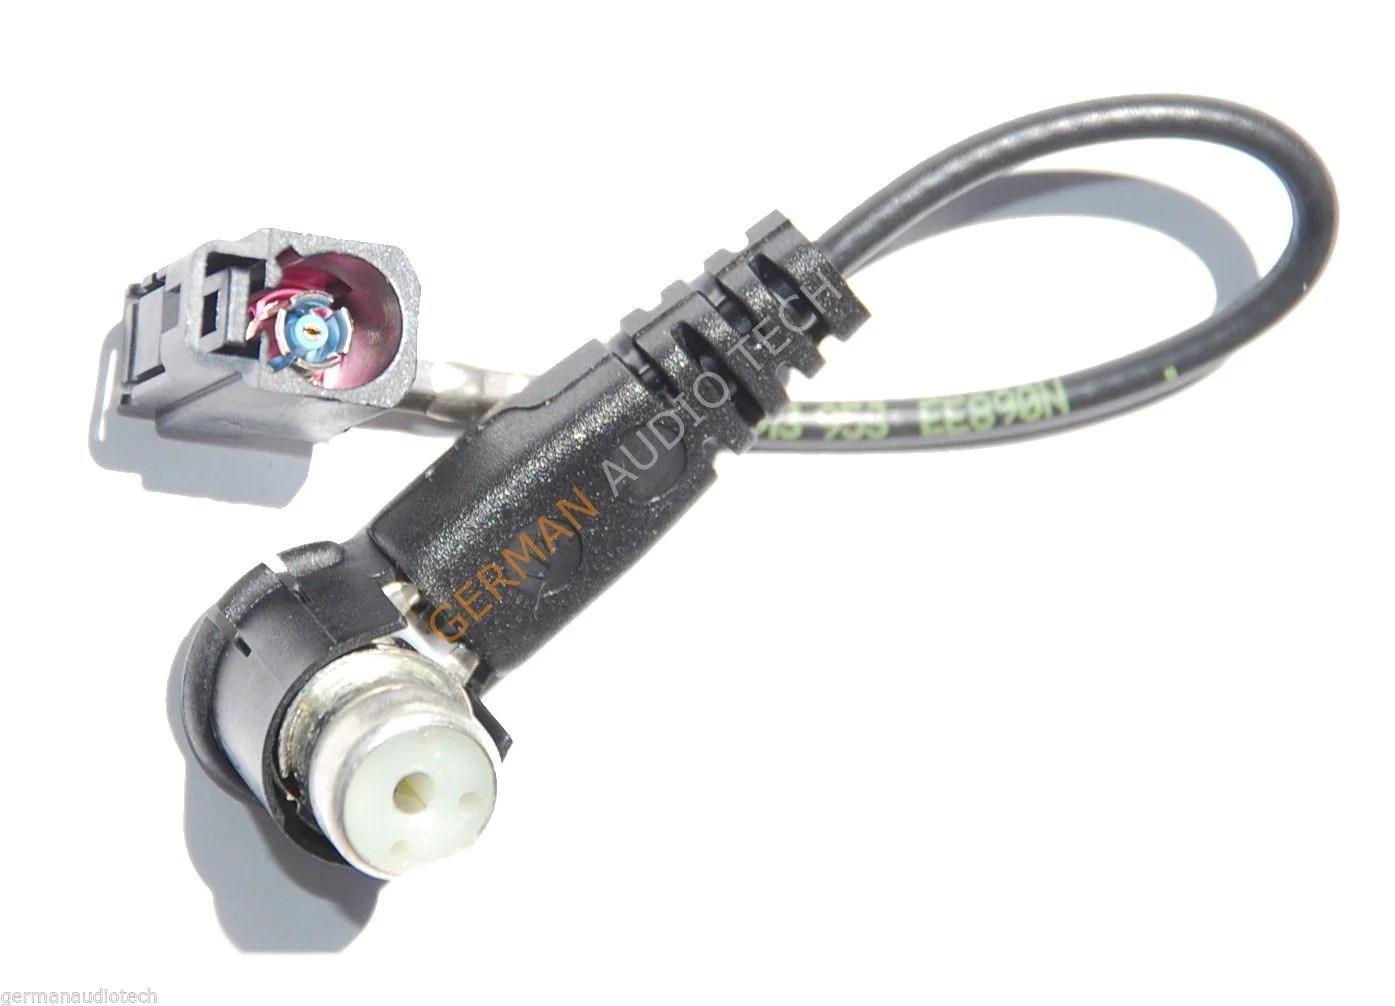 antenna adapter for bmw radio harness cable business cd mini e46 m3 e39 m5 e53 x5  [ 1395 x 1006 Pixel ]